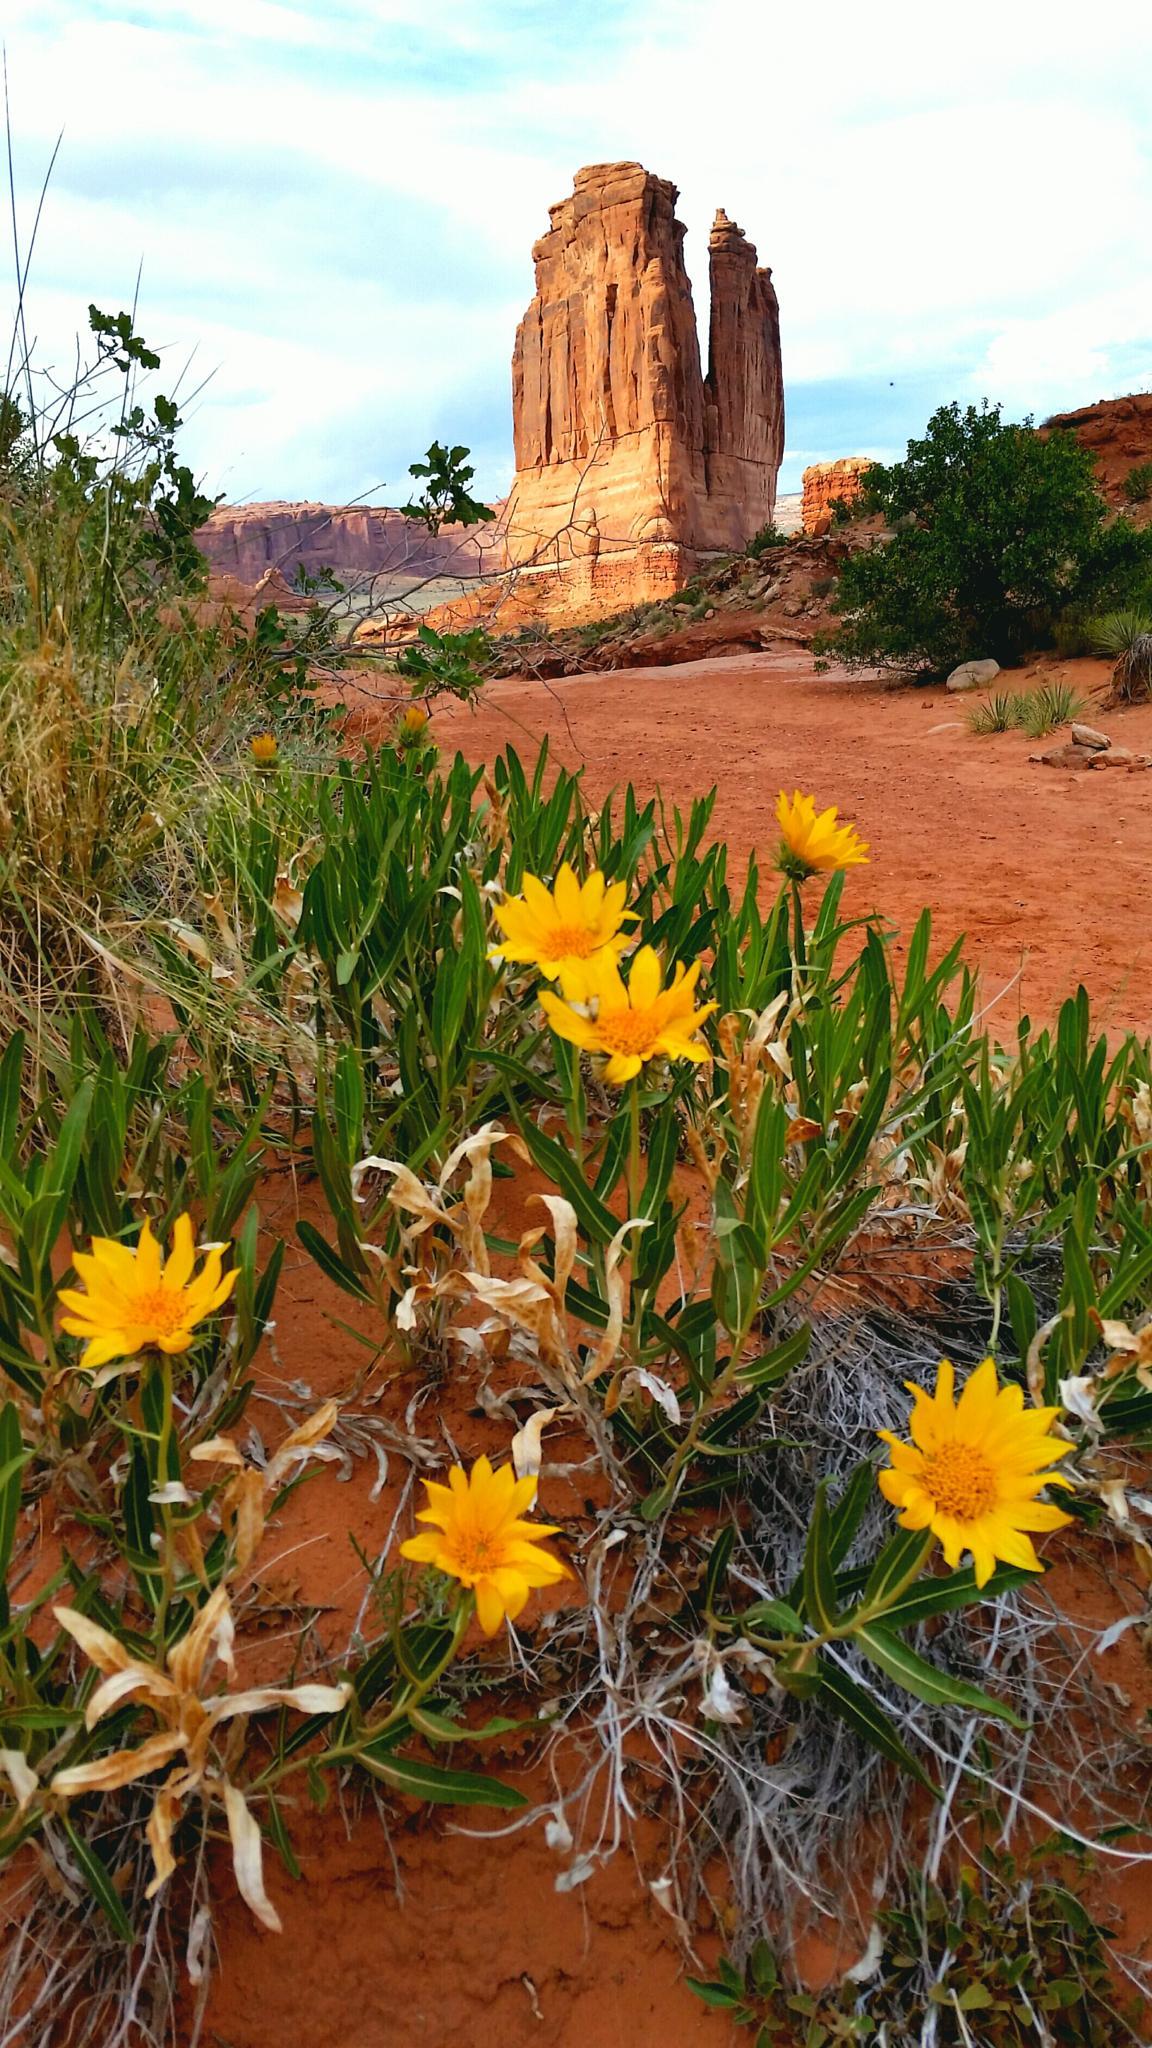 Desert Blossoms by Garth Rogers